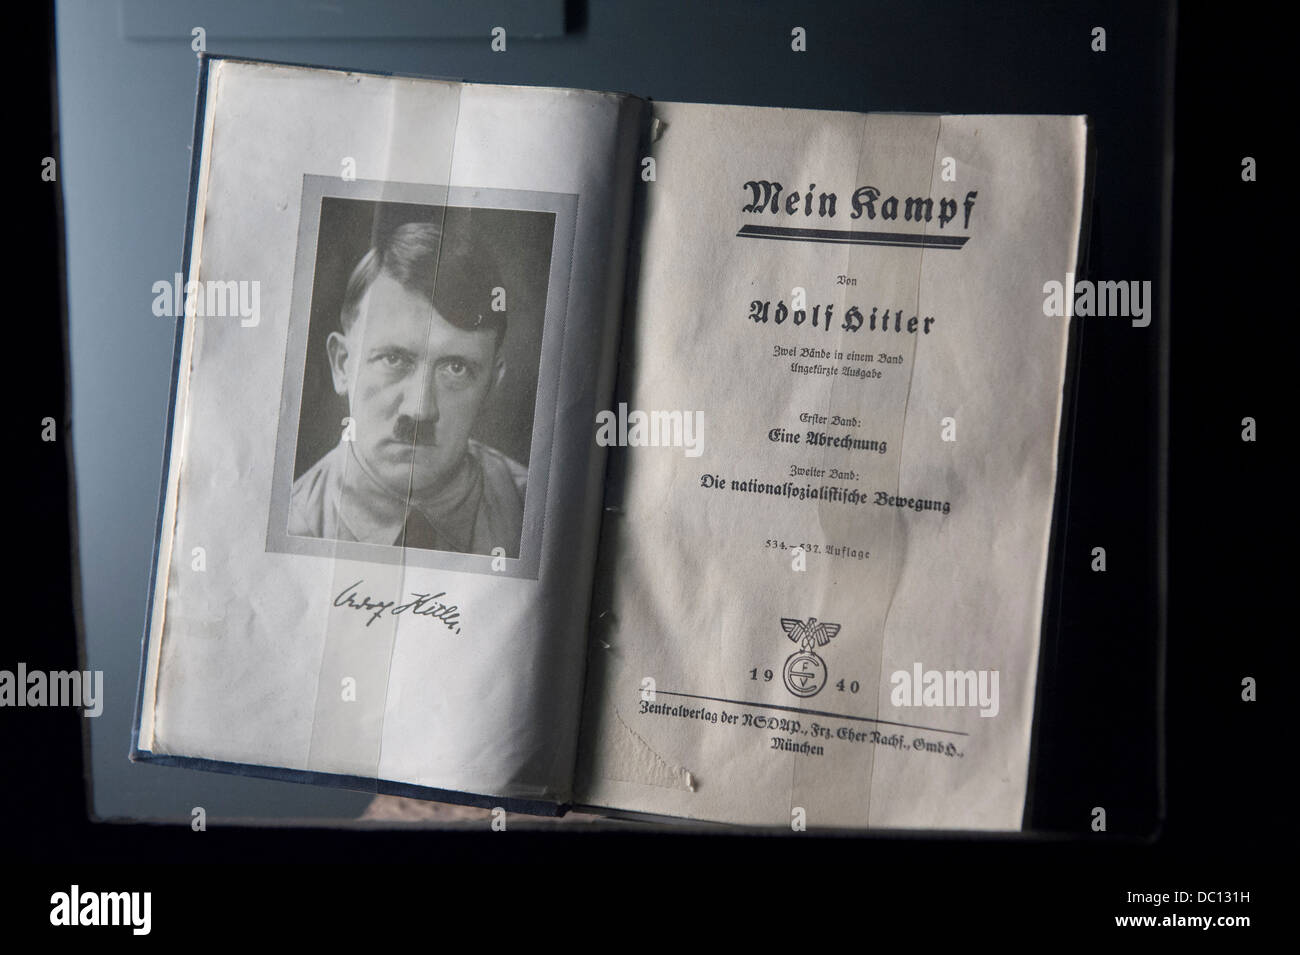 Europe, Germany, Bavaria, Nuremberg, Mein Kampf, Documentation Center. - Stock Image